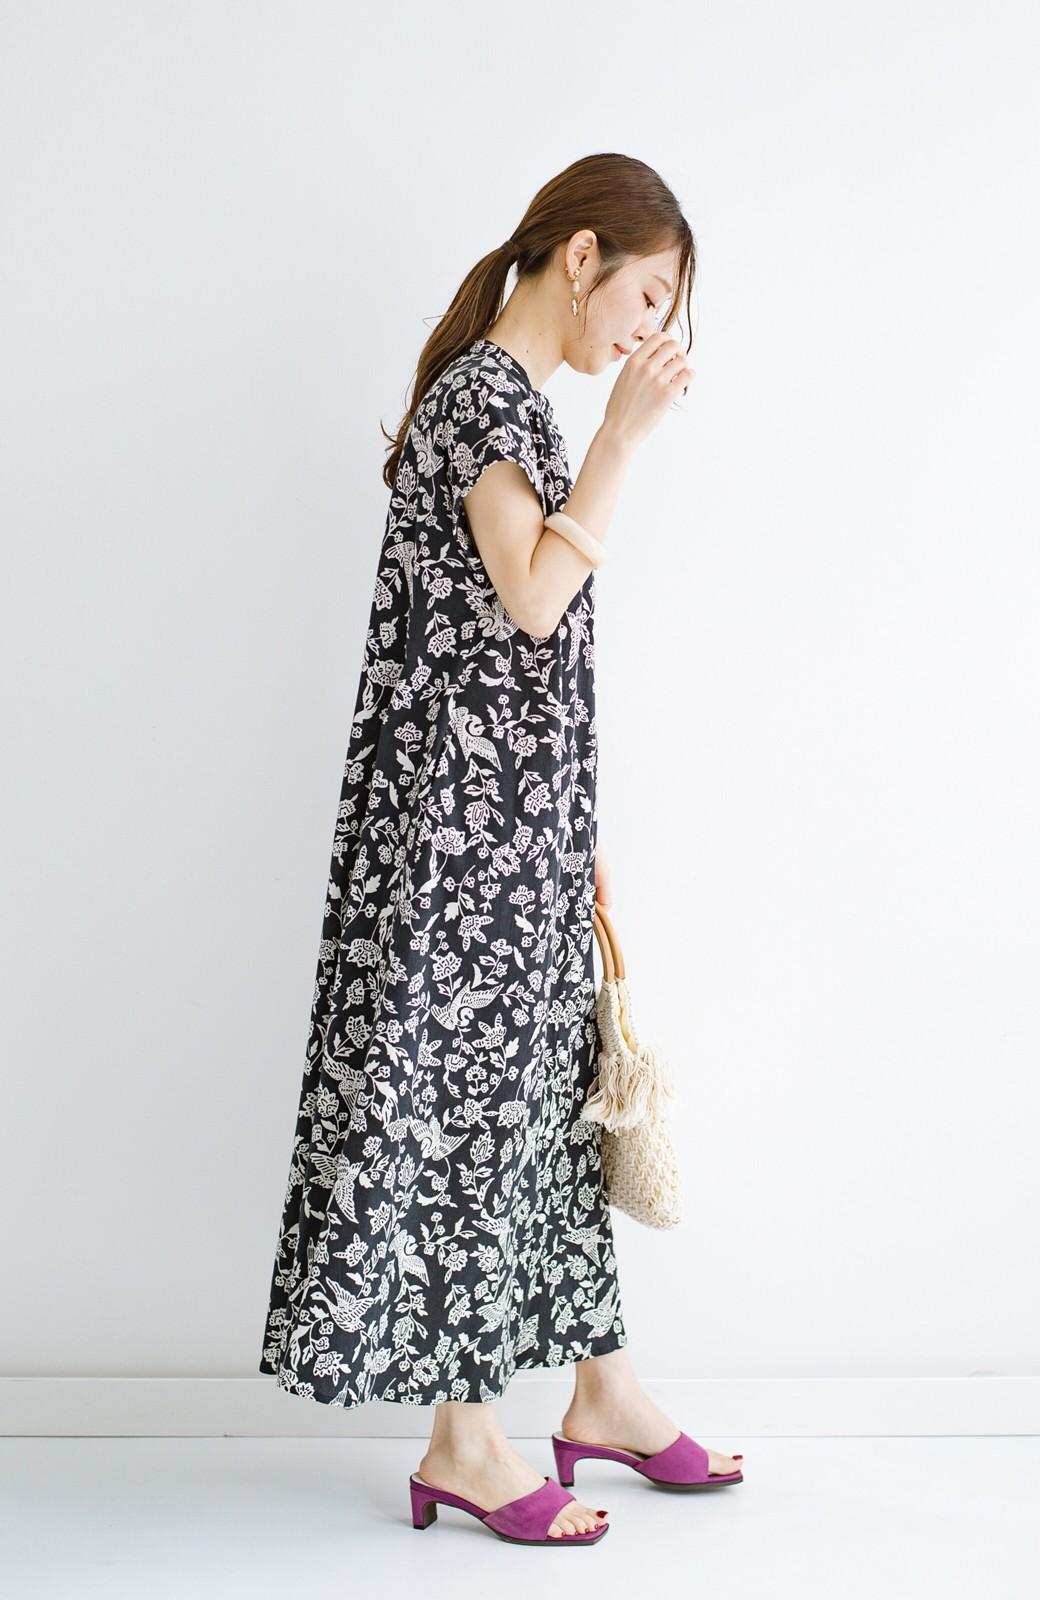 haco! 京都の浴衣屋さんと作った浴衣生地の羽織ってもかわいいロングワンピース <ブラック系その他>の商品写真17